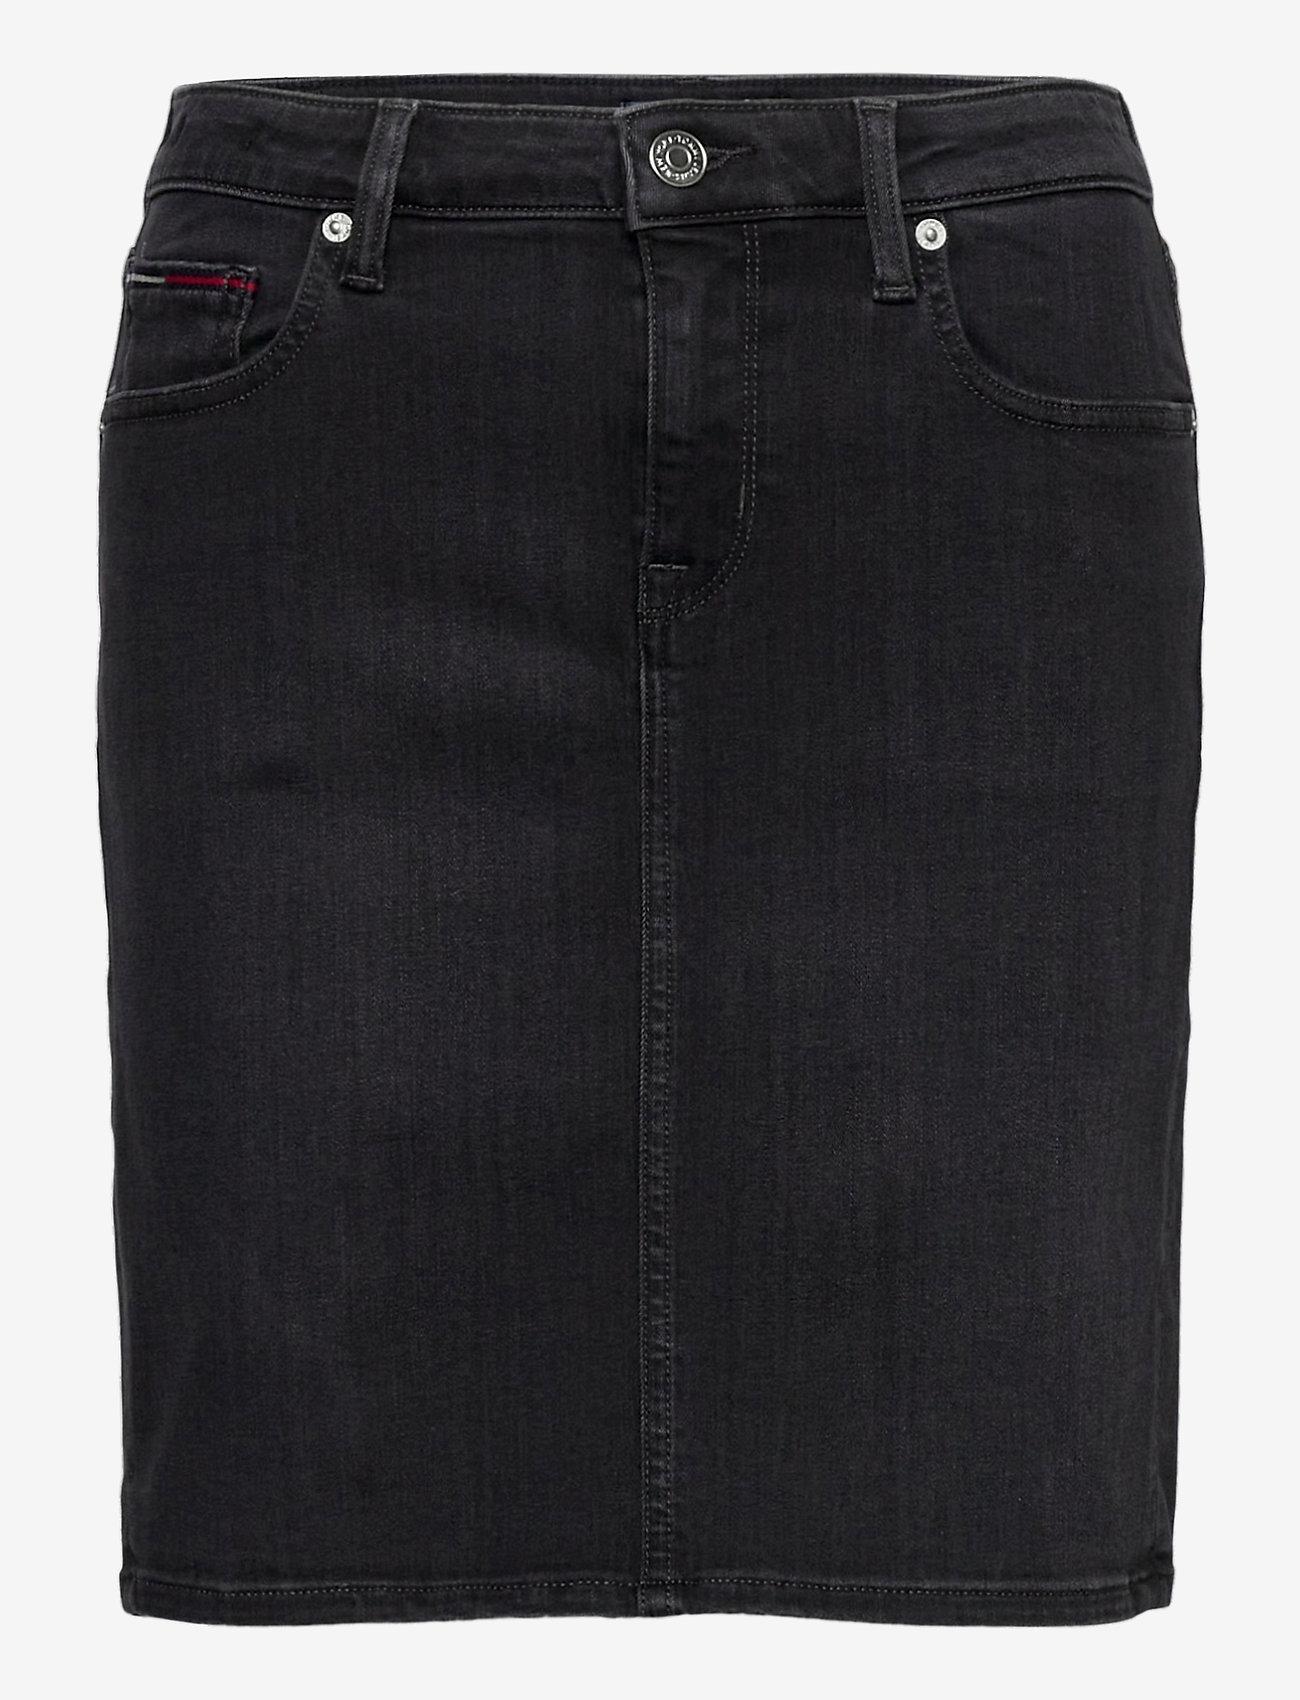 Tommy Jeans - CLASSIC DENIM SKIRT BRBK - jeanskjolar - bird black stretch - 0